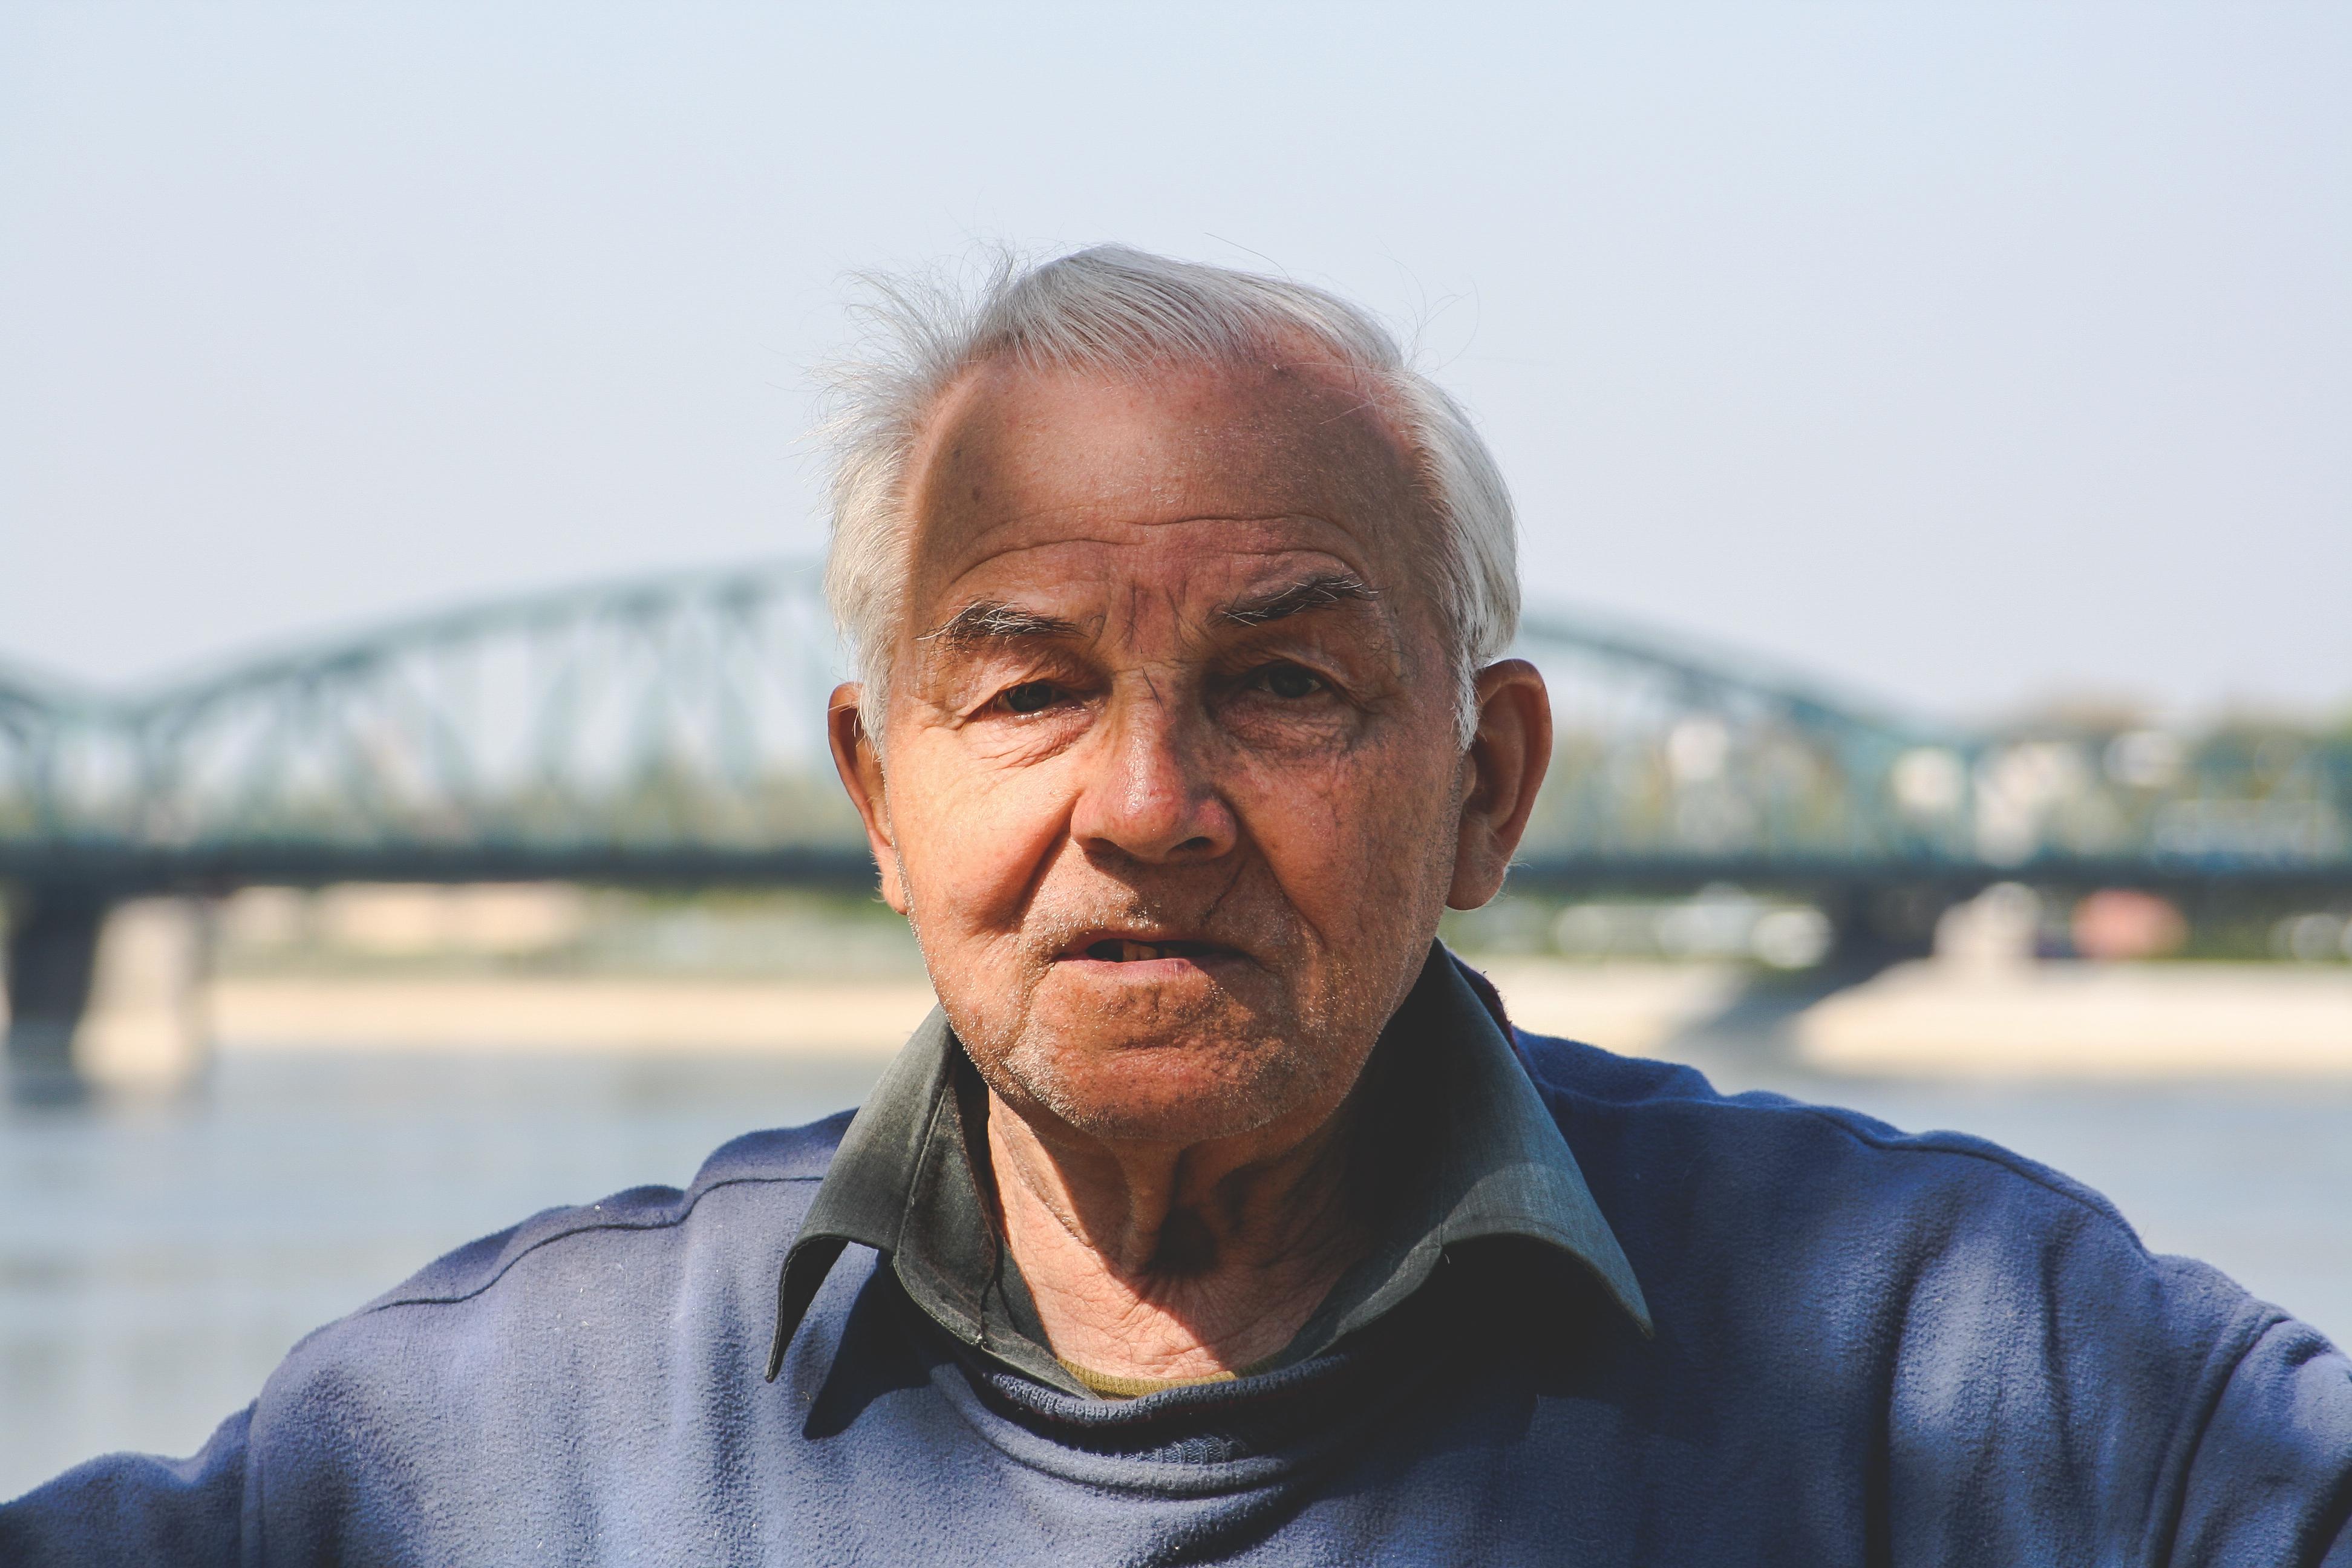 Gambar Orang Orang Orang Tua Pria Potret Biru Raut